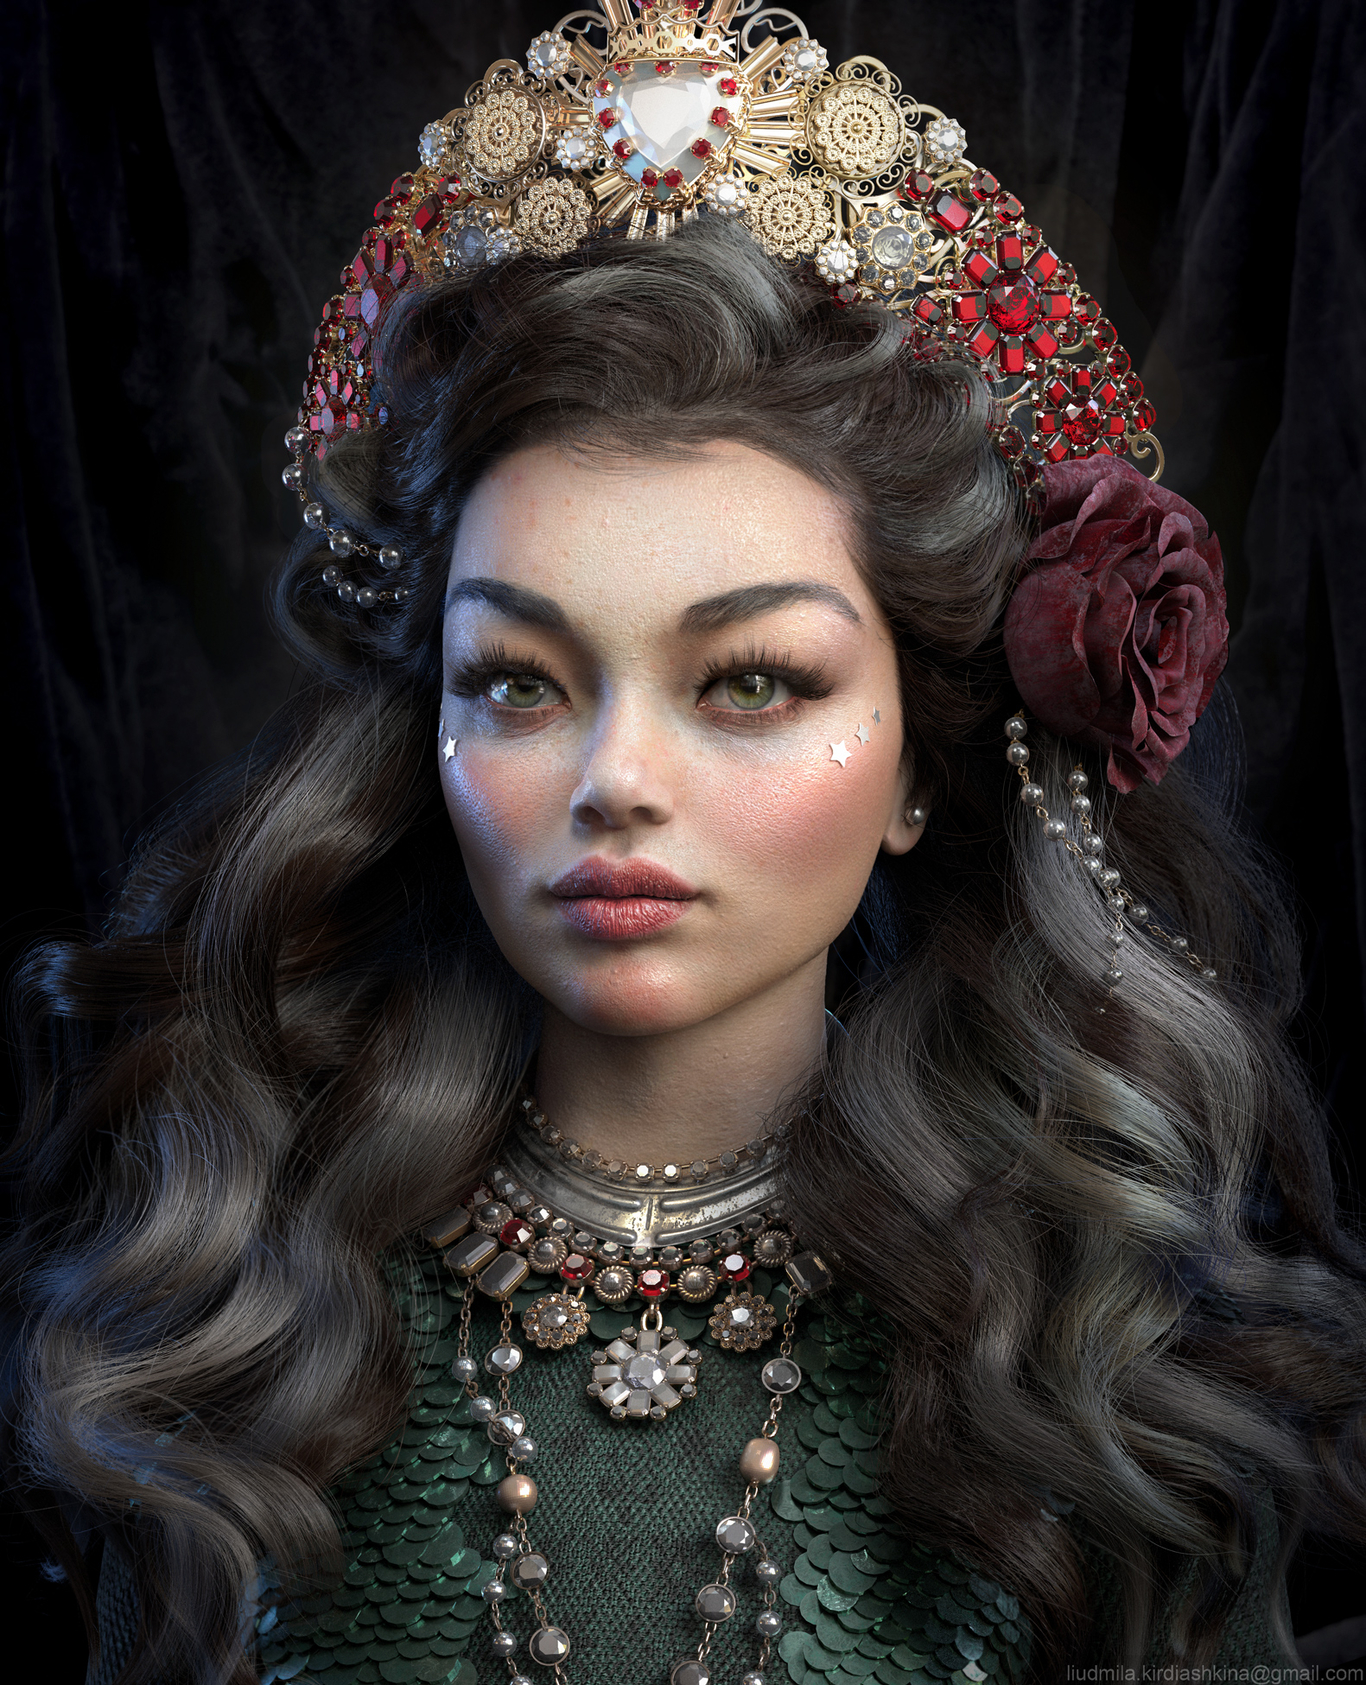 Liudmila girl and jewelry 1 b0426e0a d6wj